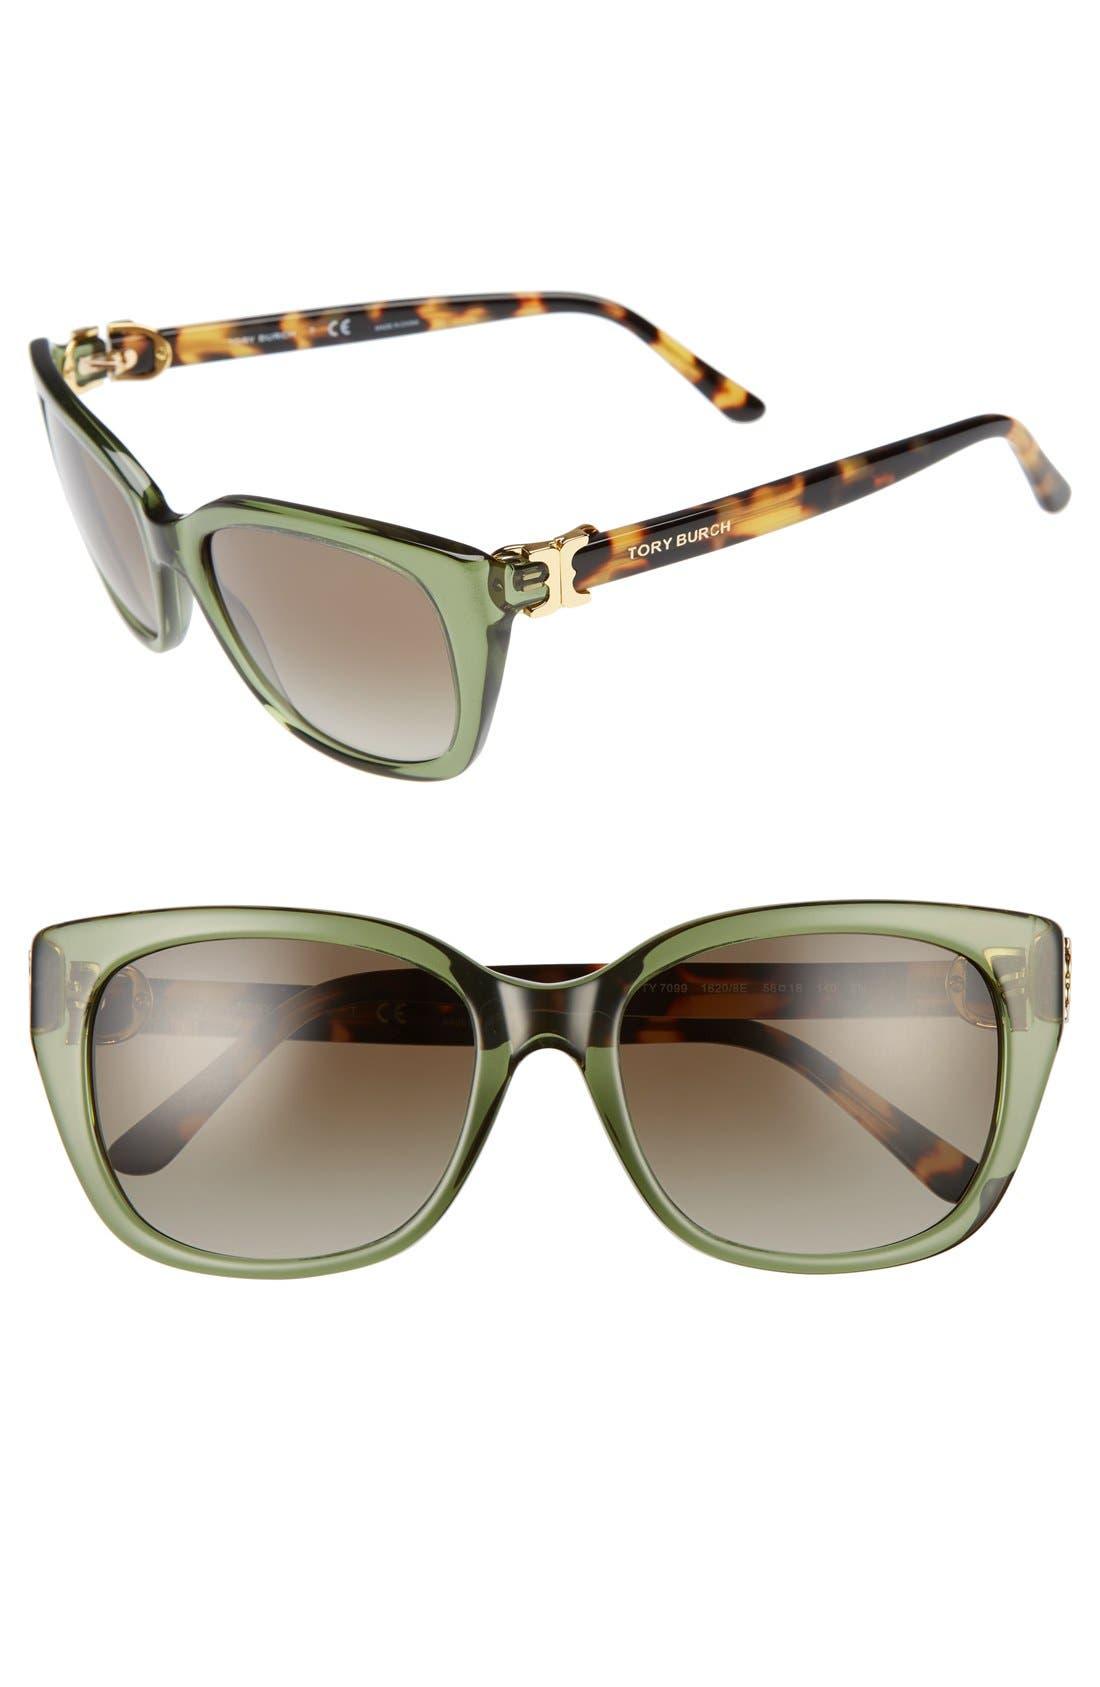 TORY BURCH 56mm Cat Eye Sunglasses